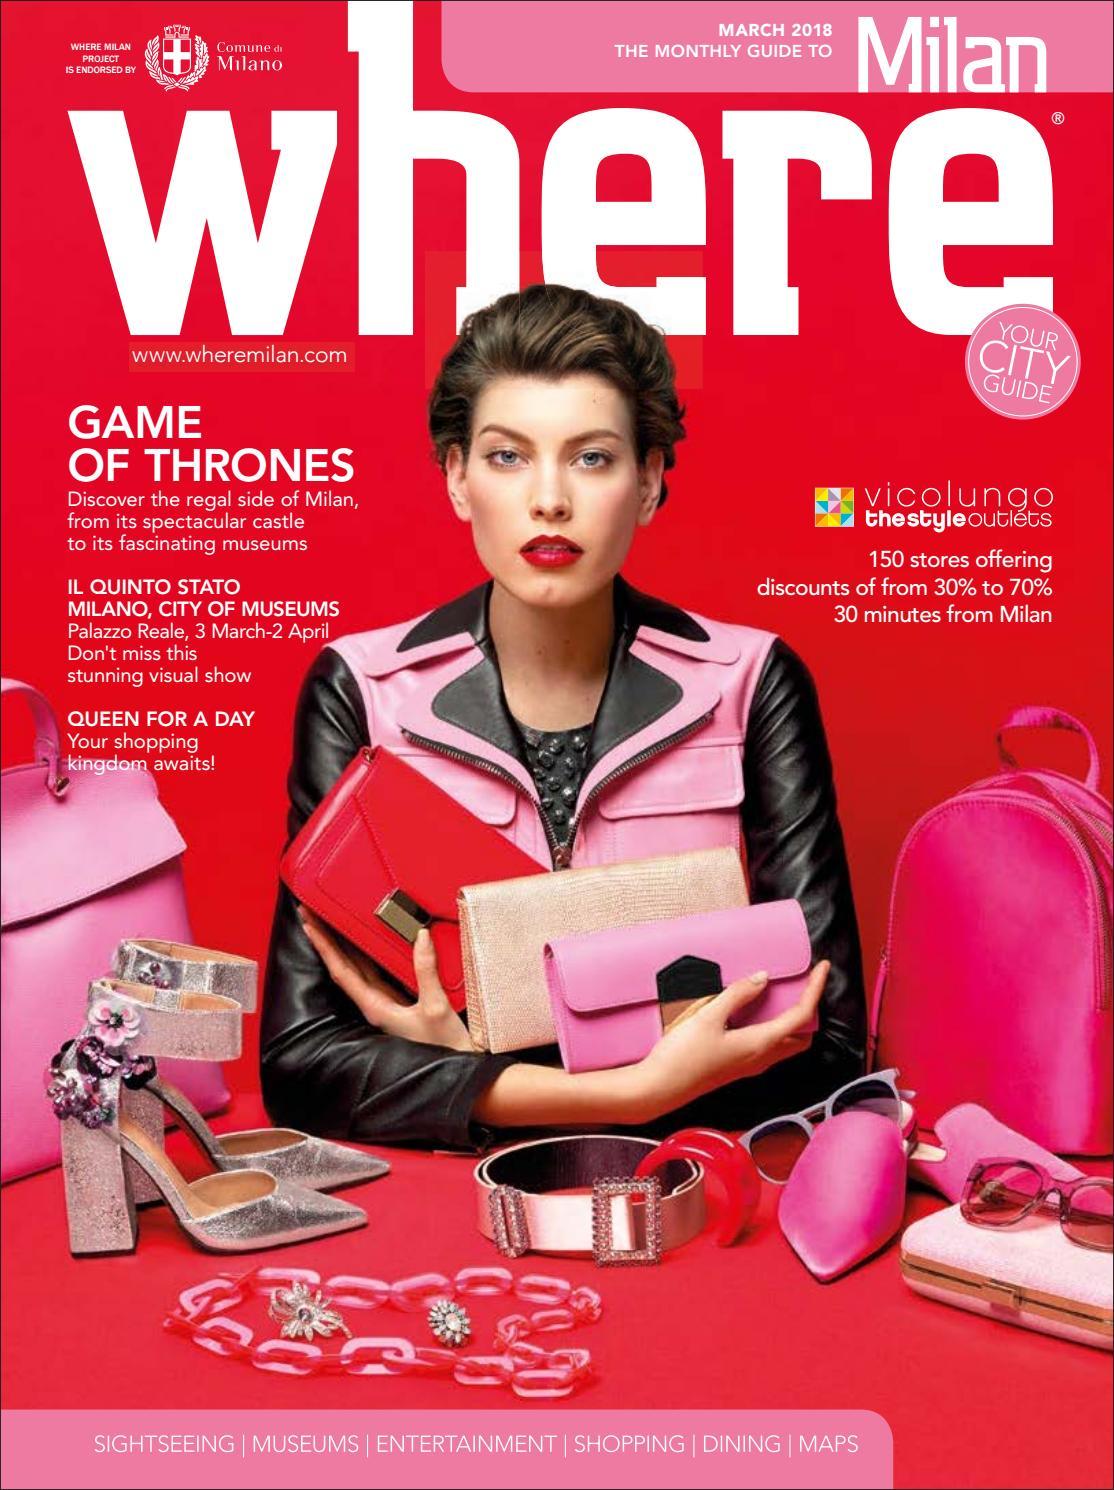 Where Magazine Milan Mar 2018 by Morris Media Network - issuu b3353c292